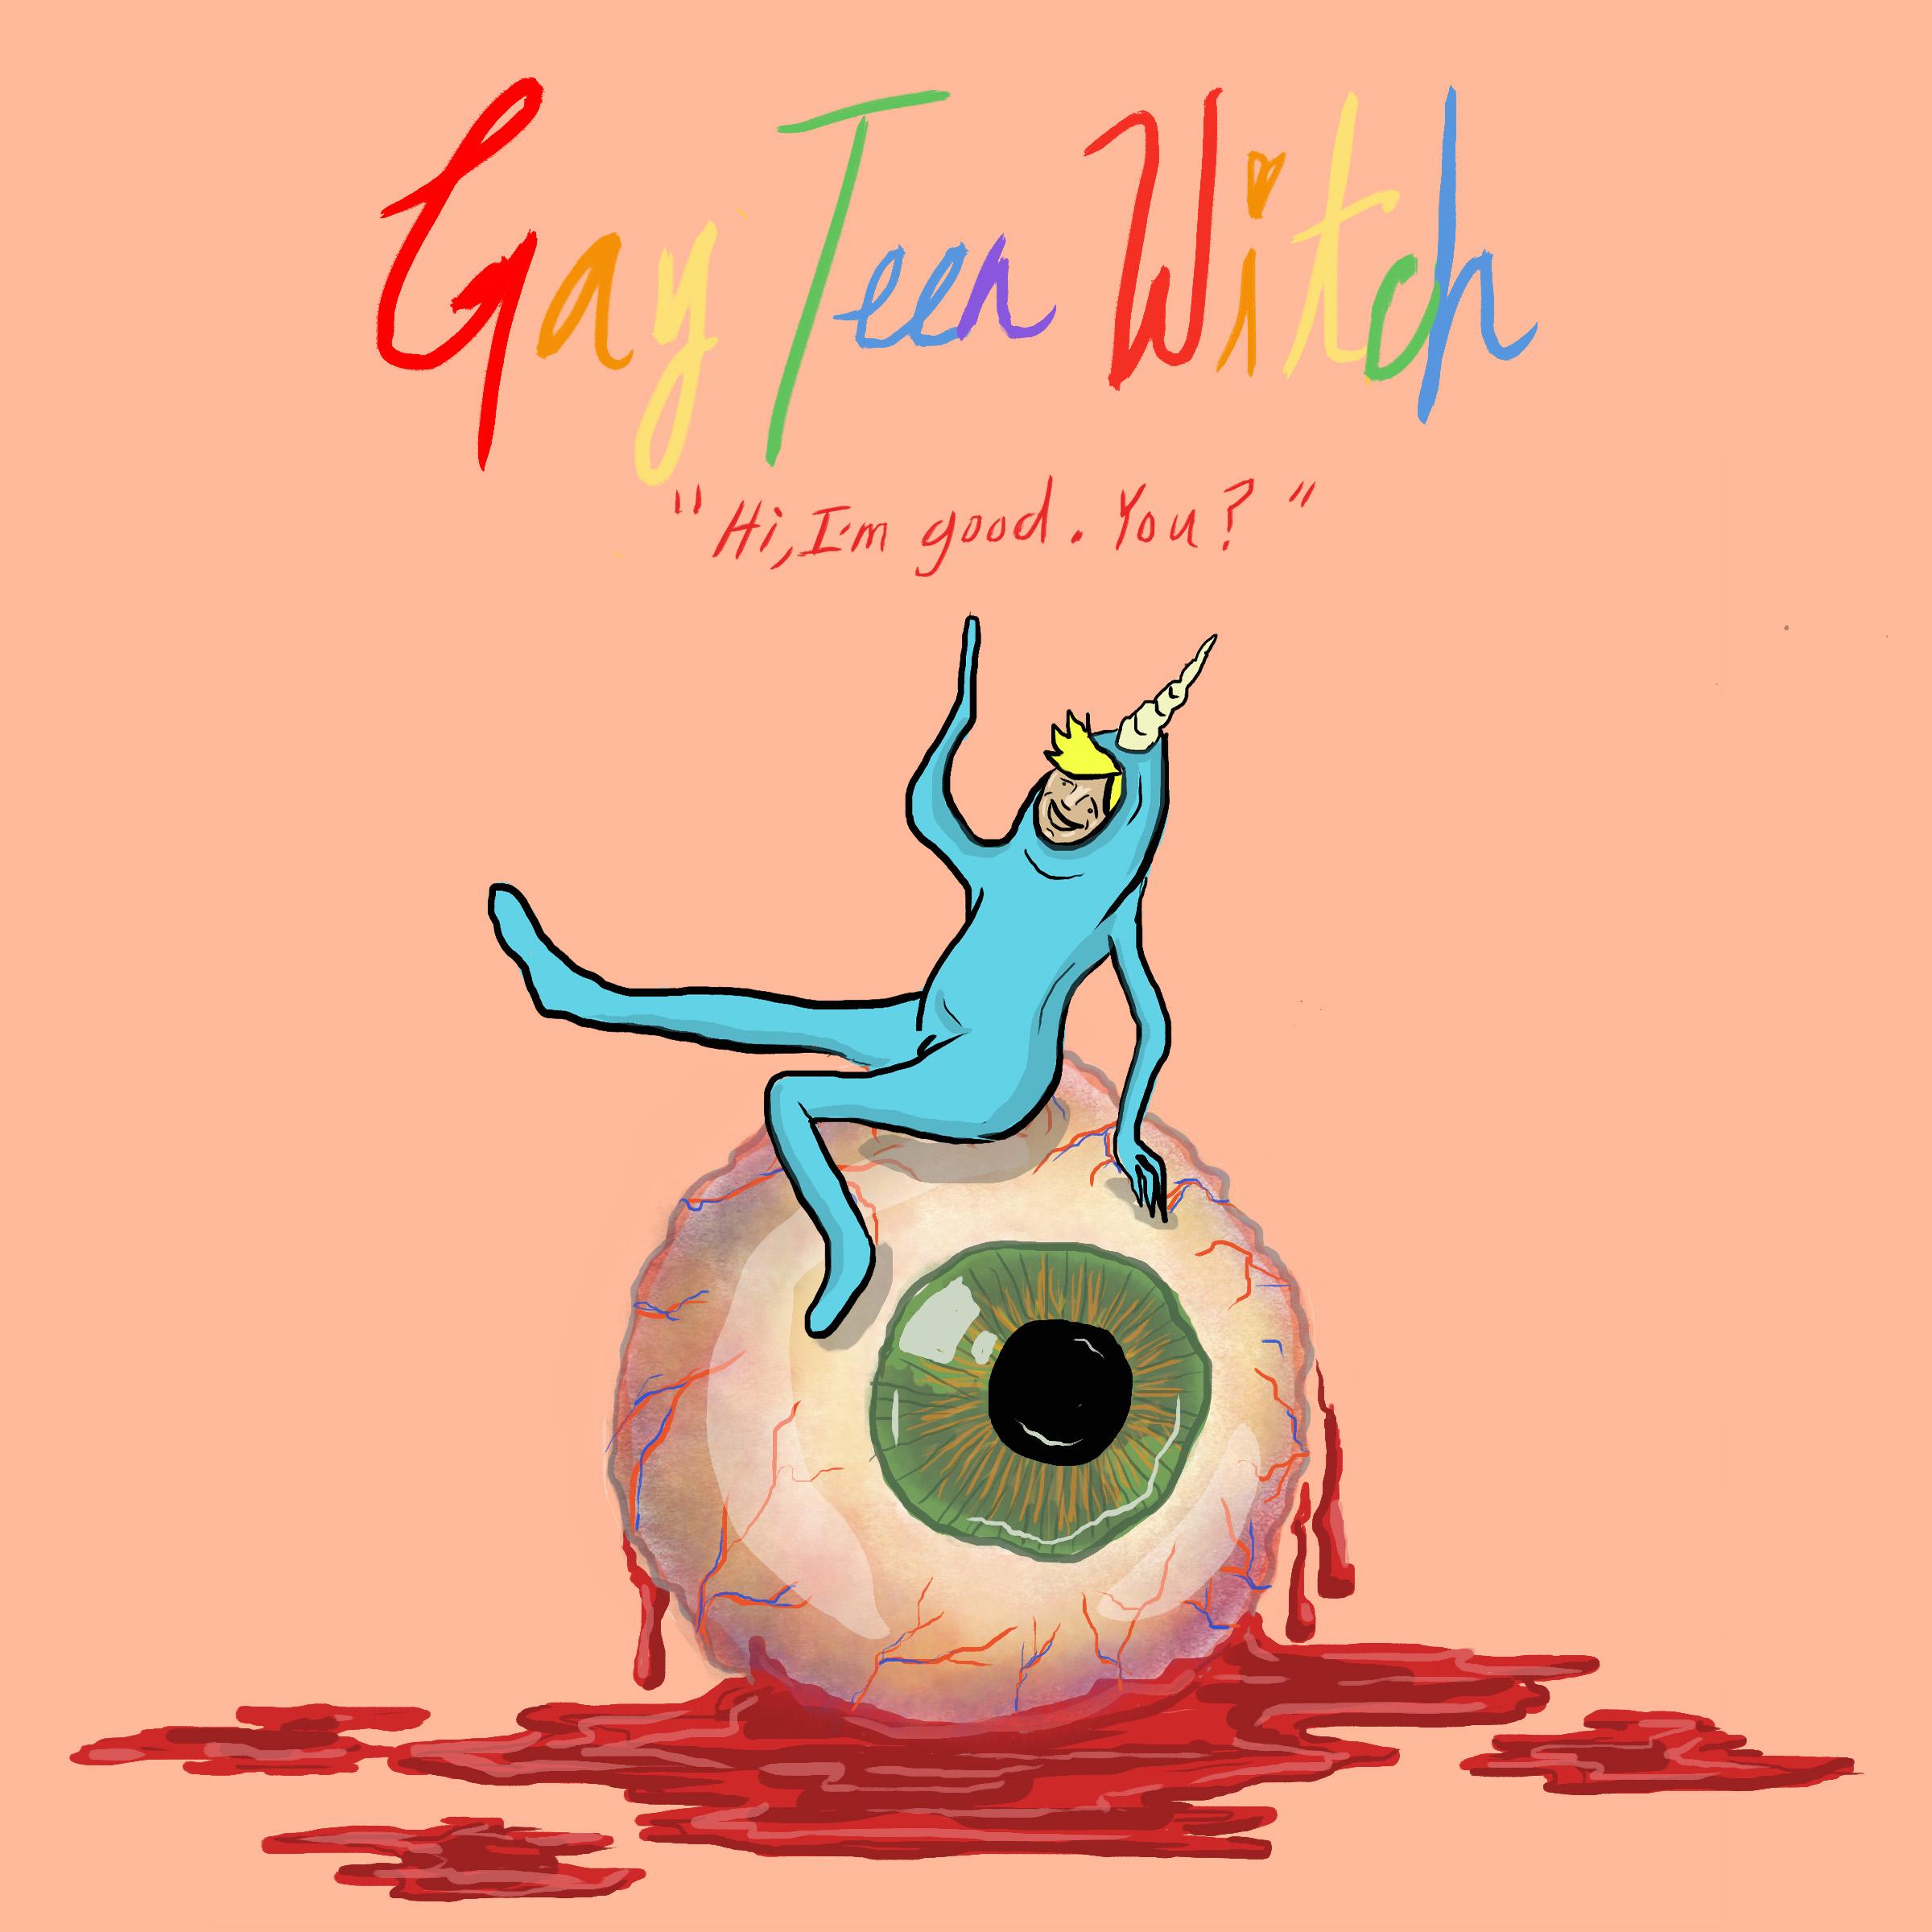 GayTeenWitch